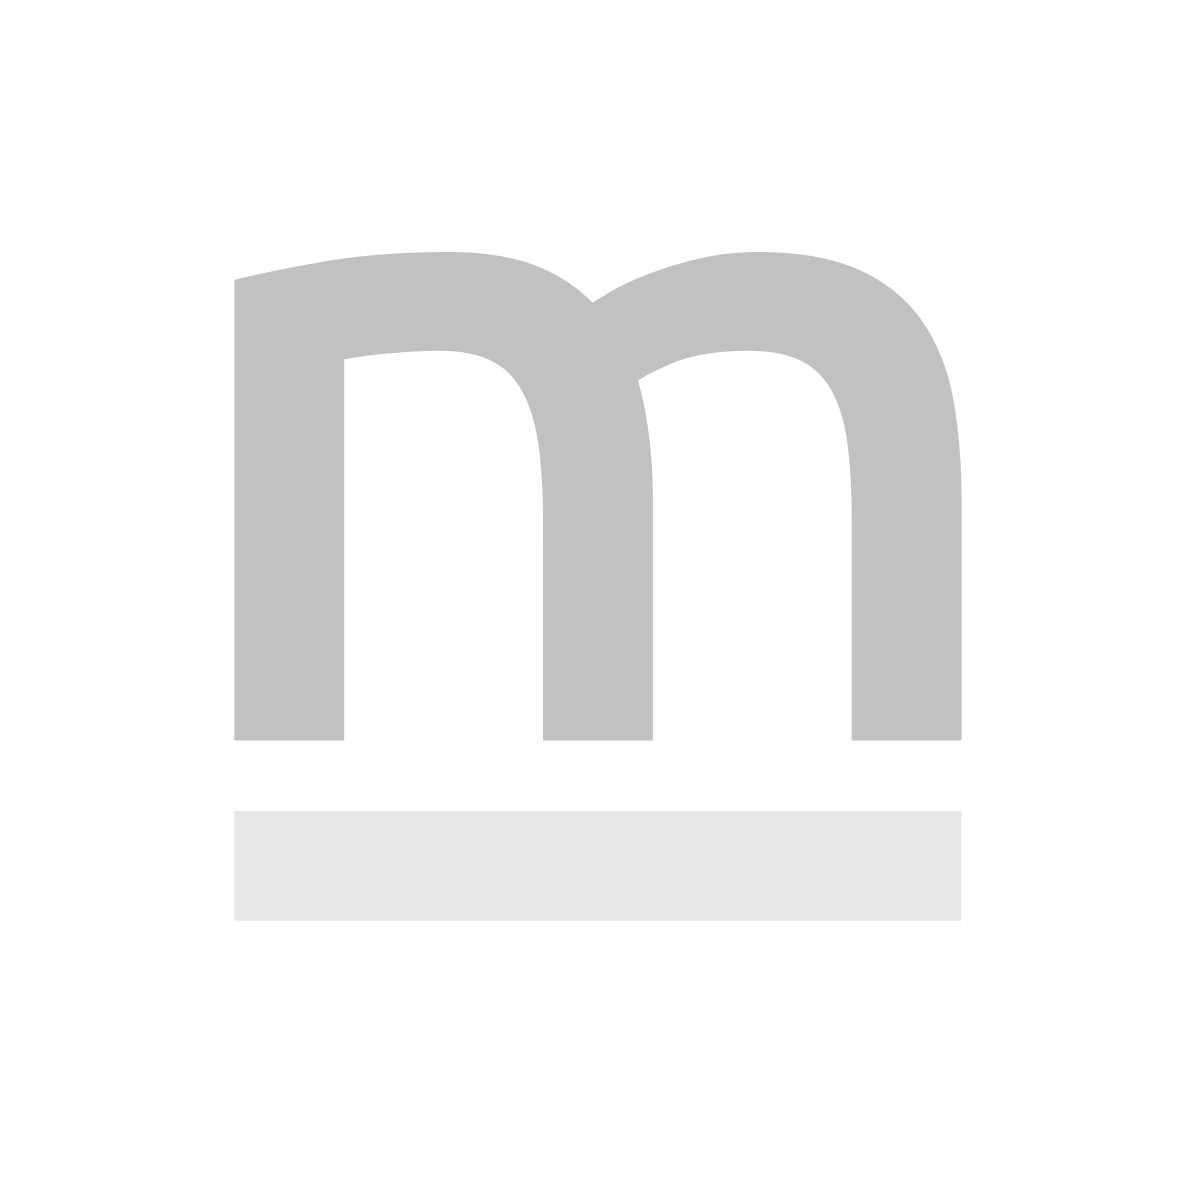 Stół ALLEGRO 160x80 transparentny